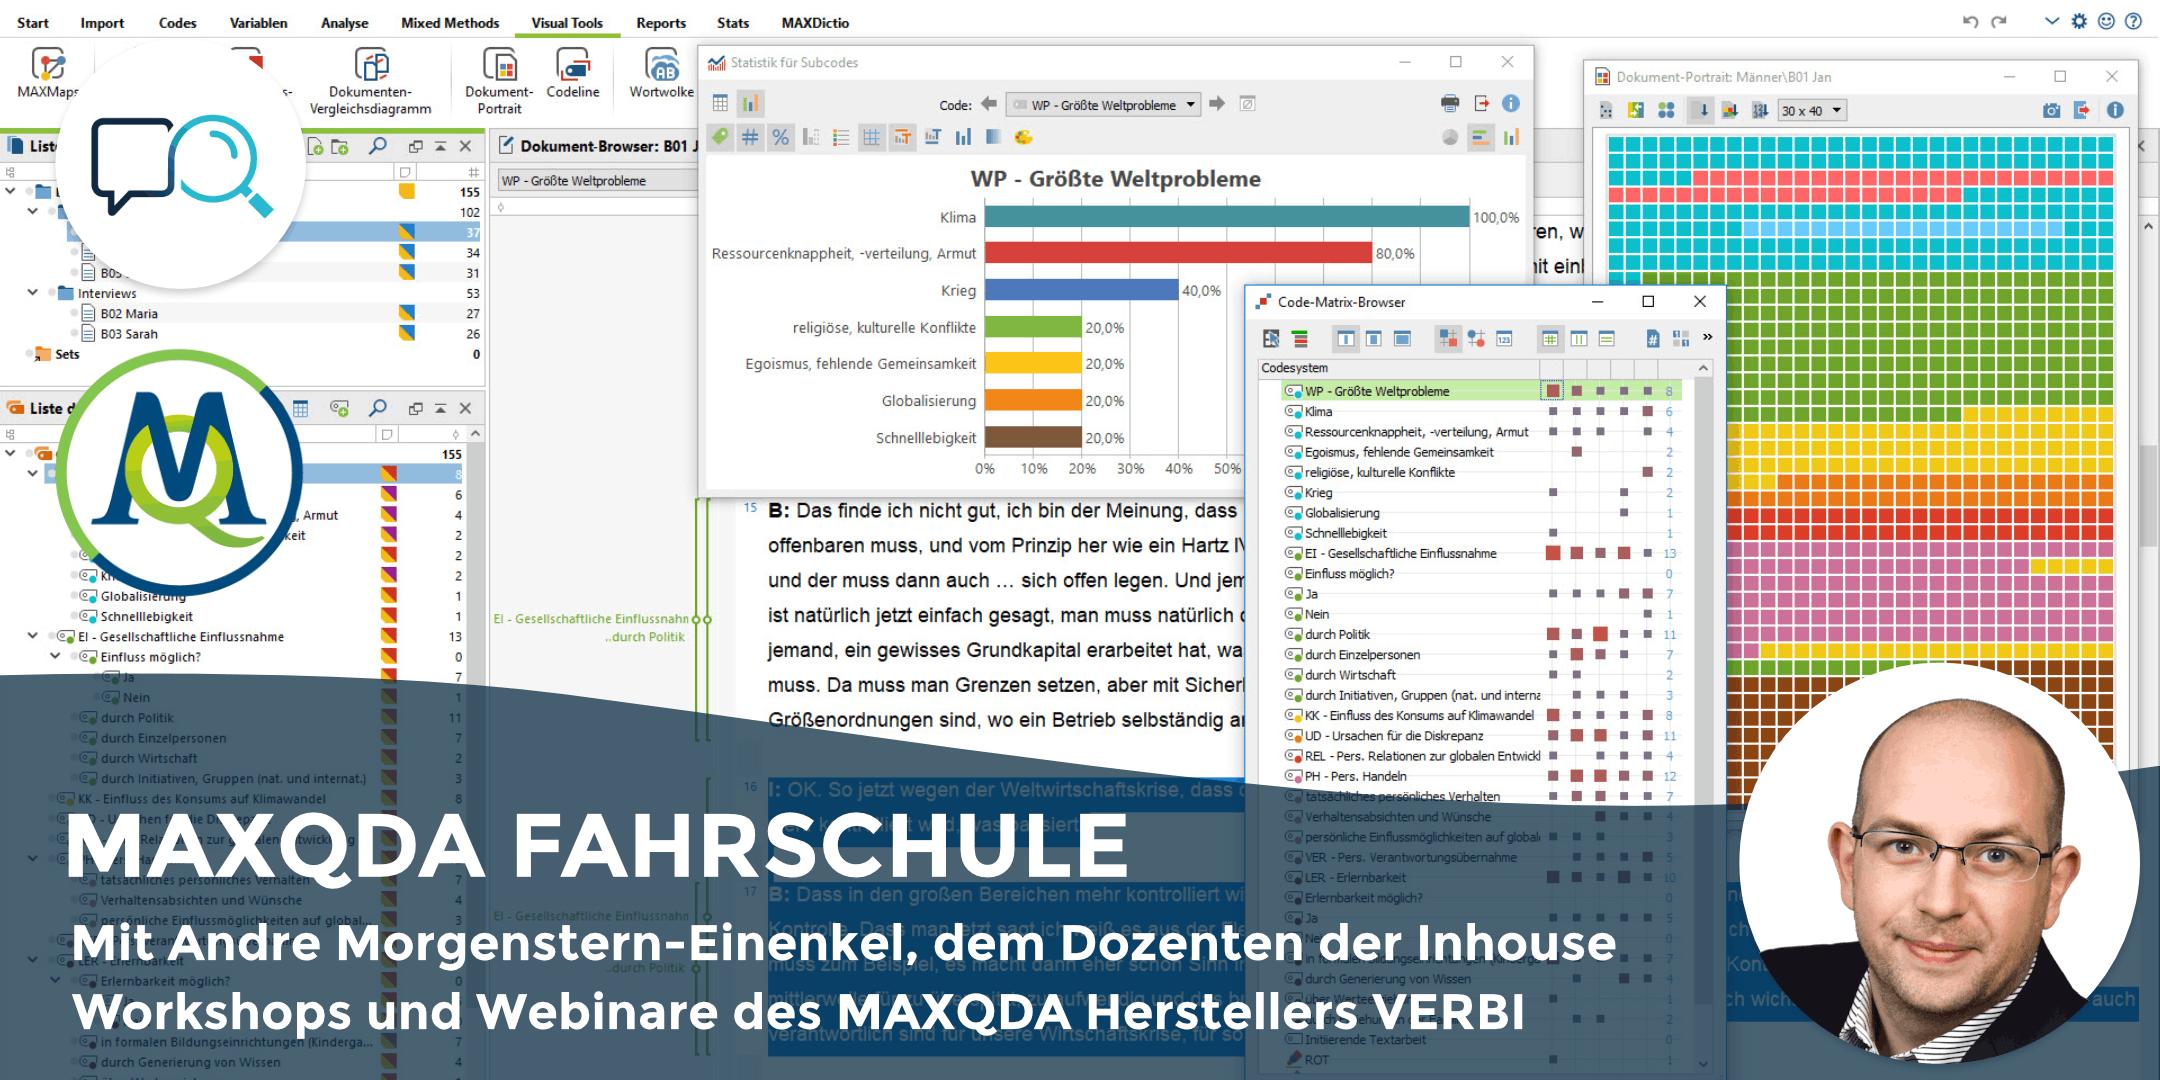 MAXQDA FAHRSCHULE - Live-Onlinetraining für Kleingruppe an 8 Abenden (Jan-Feb '19)